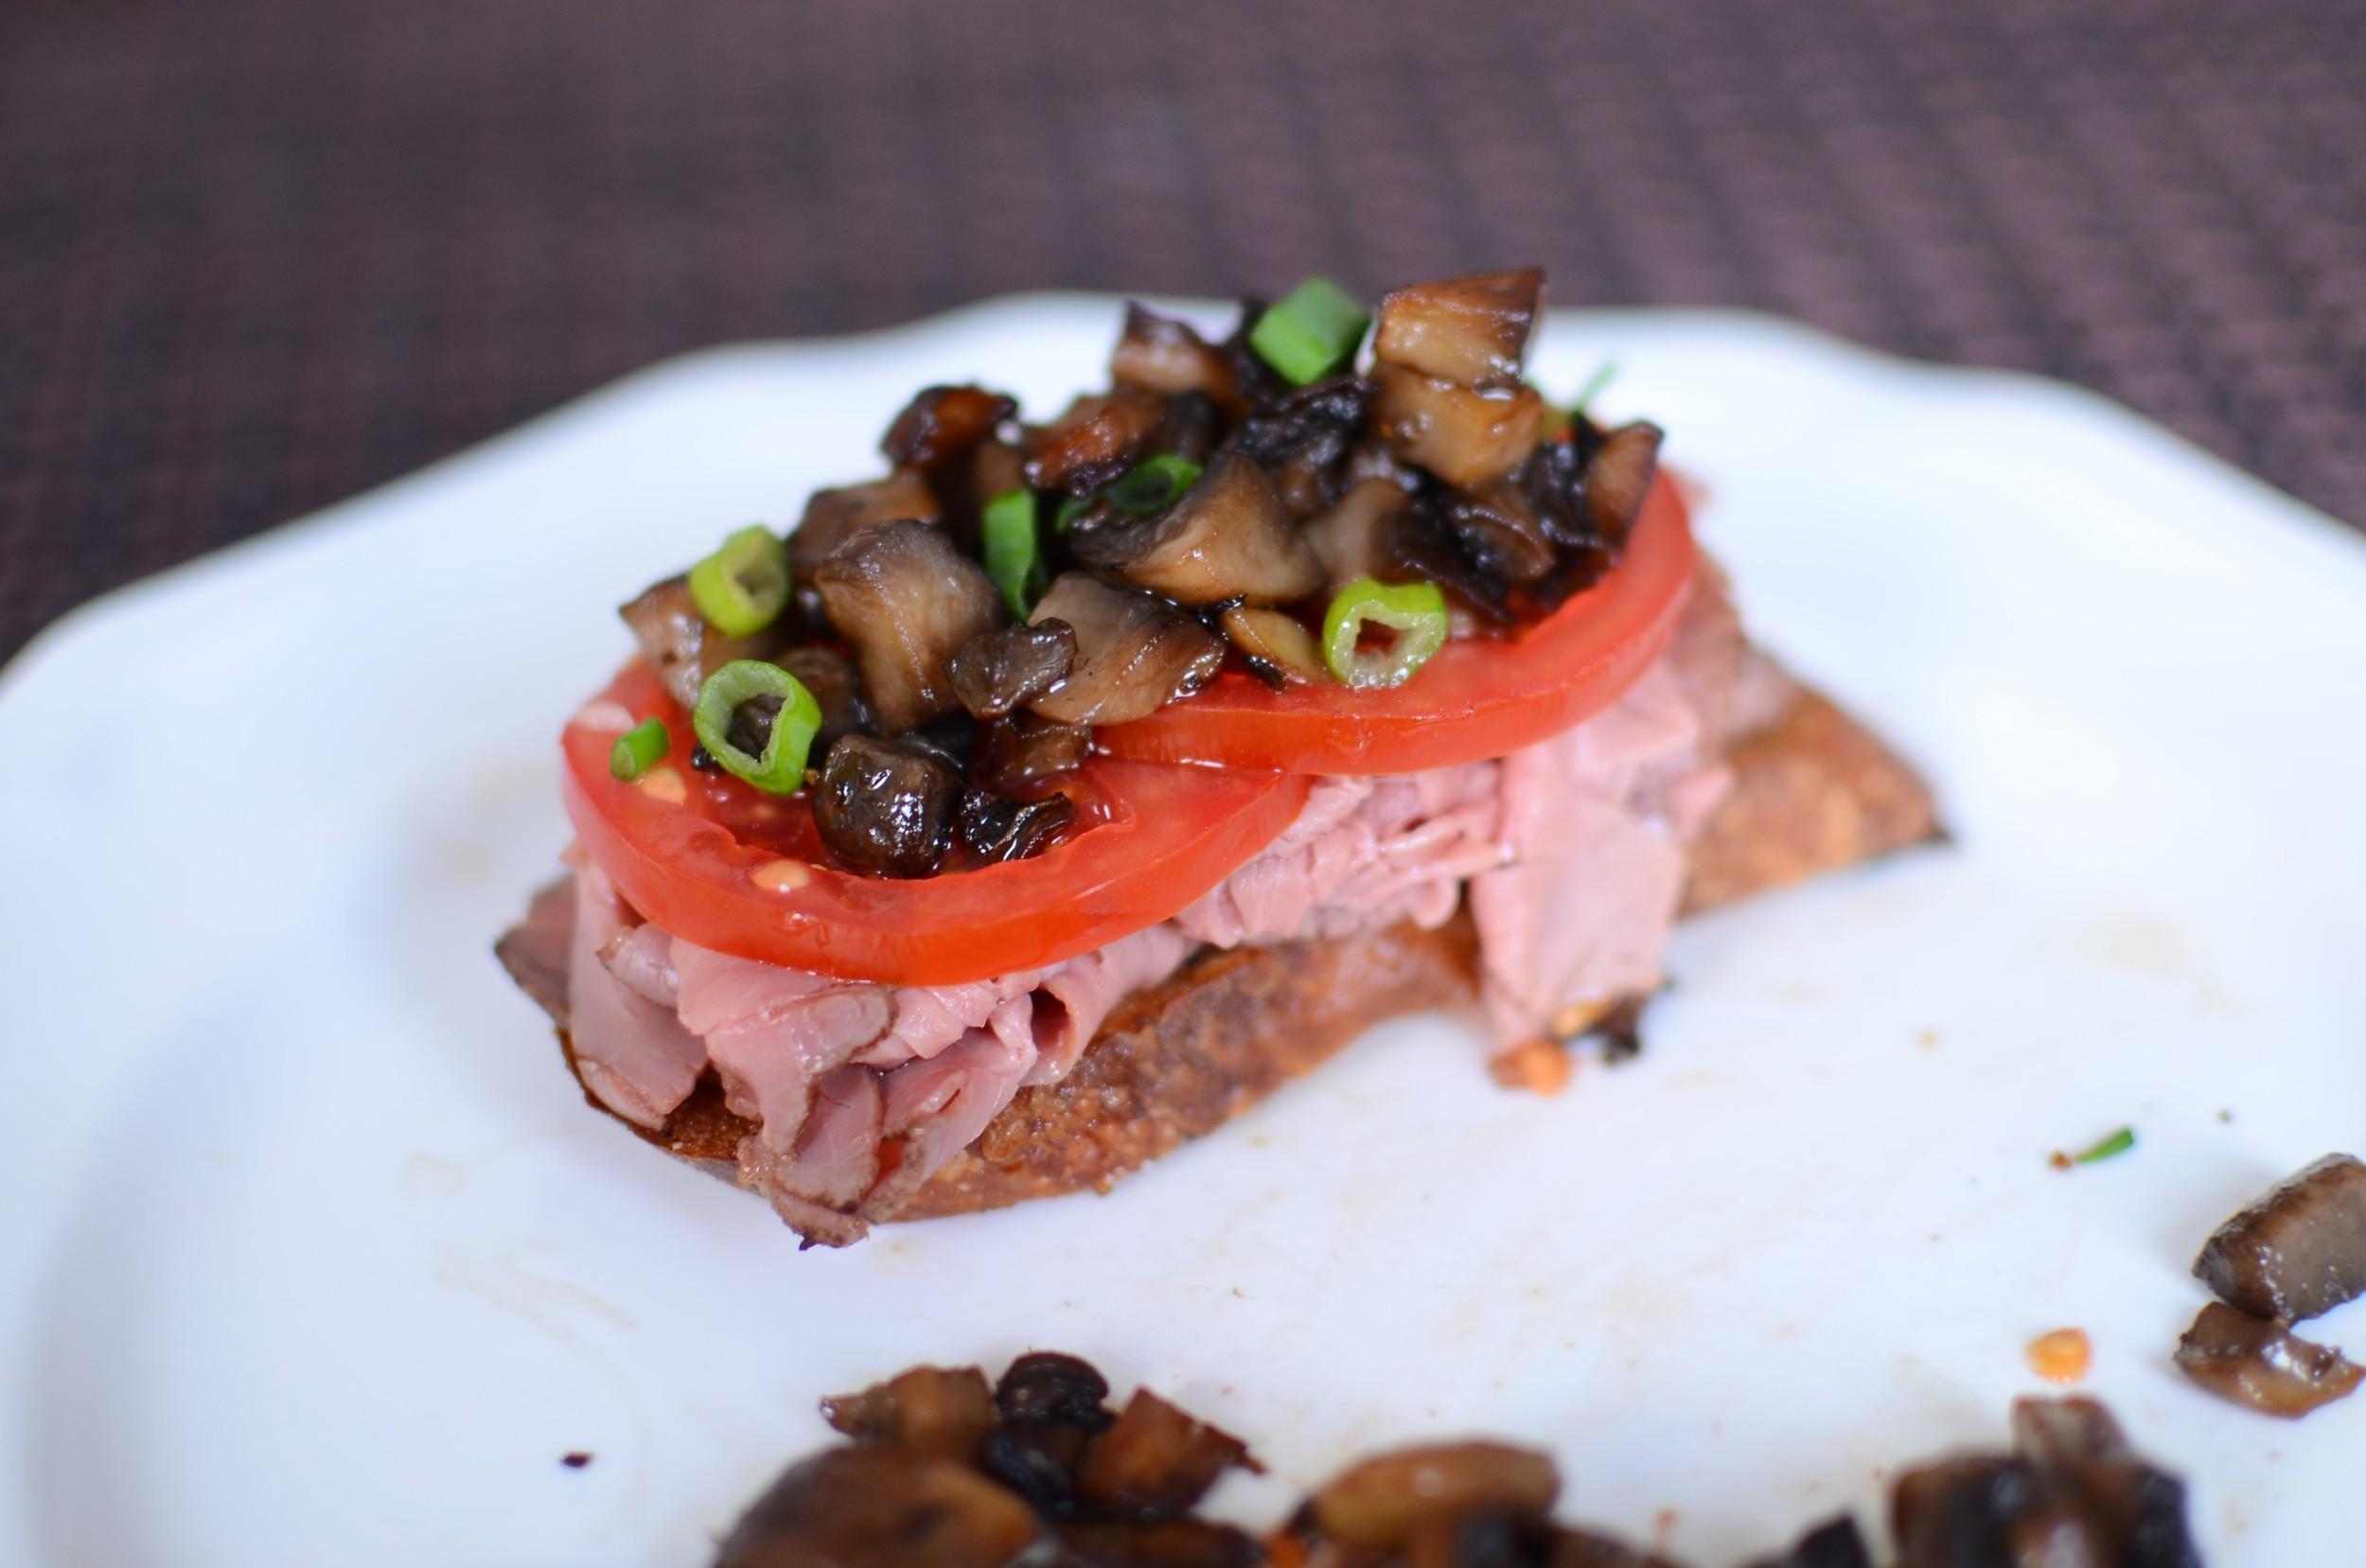 Roast Beef and Mushroom Crostini Appetizer Recipe WITH PHOTOS